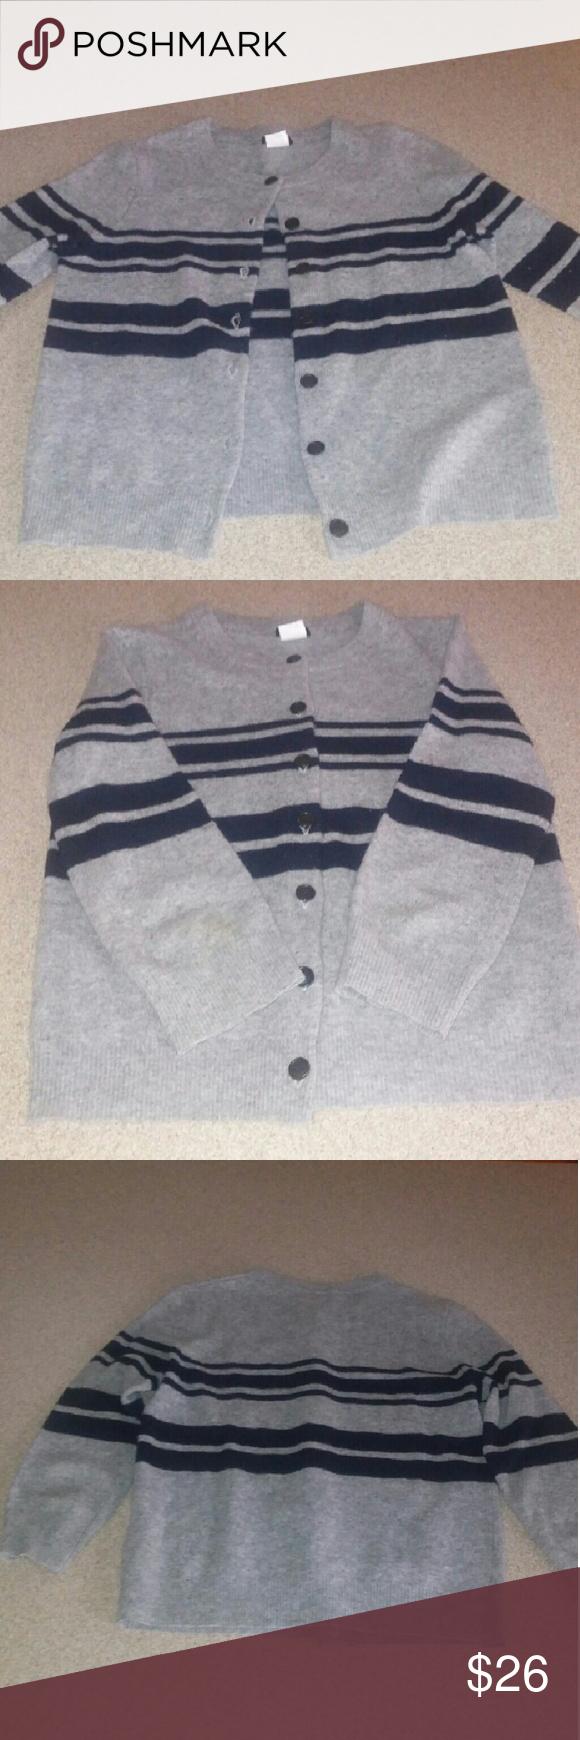 Jcrew Sweater size S Jcrew Sweater size Small great condition jcrew Sweaters